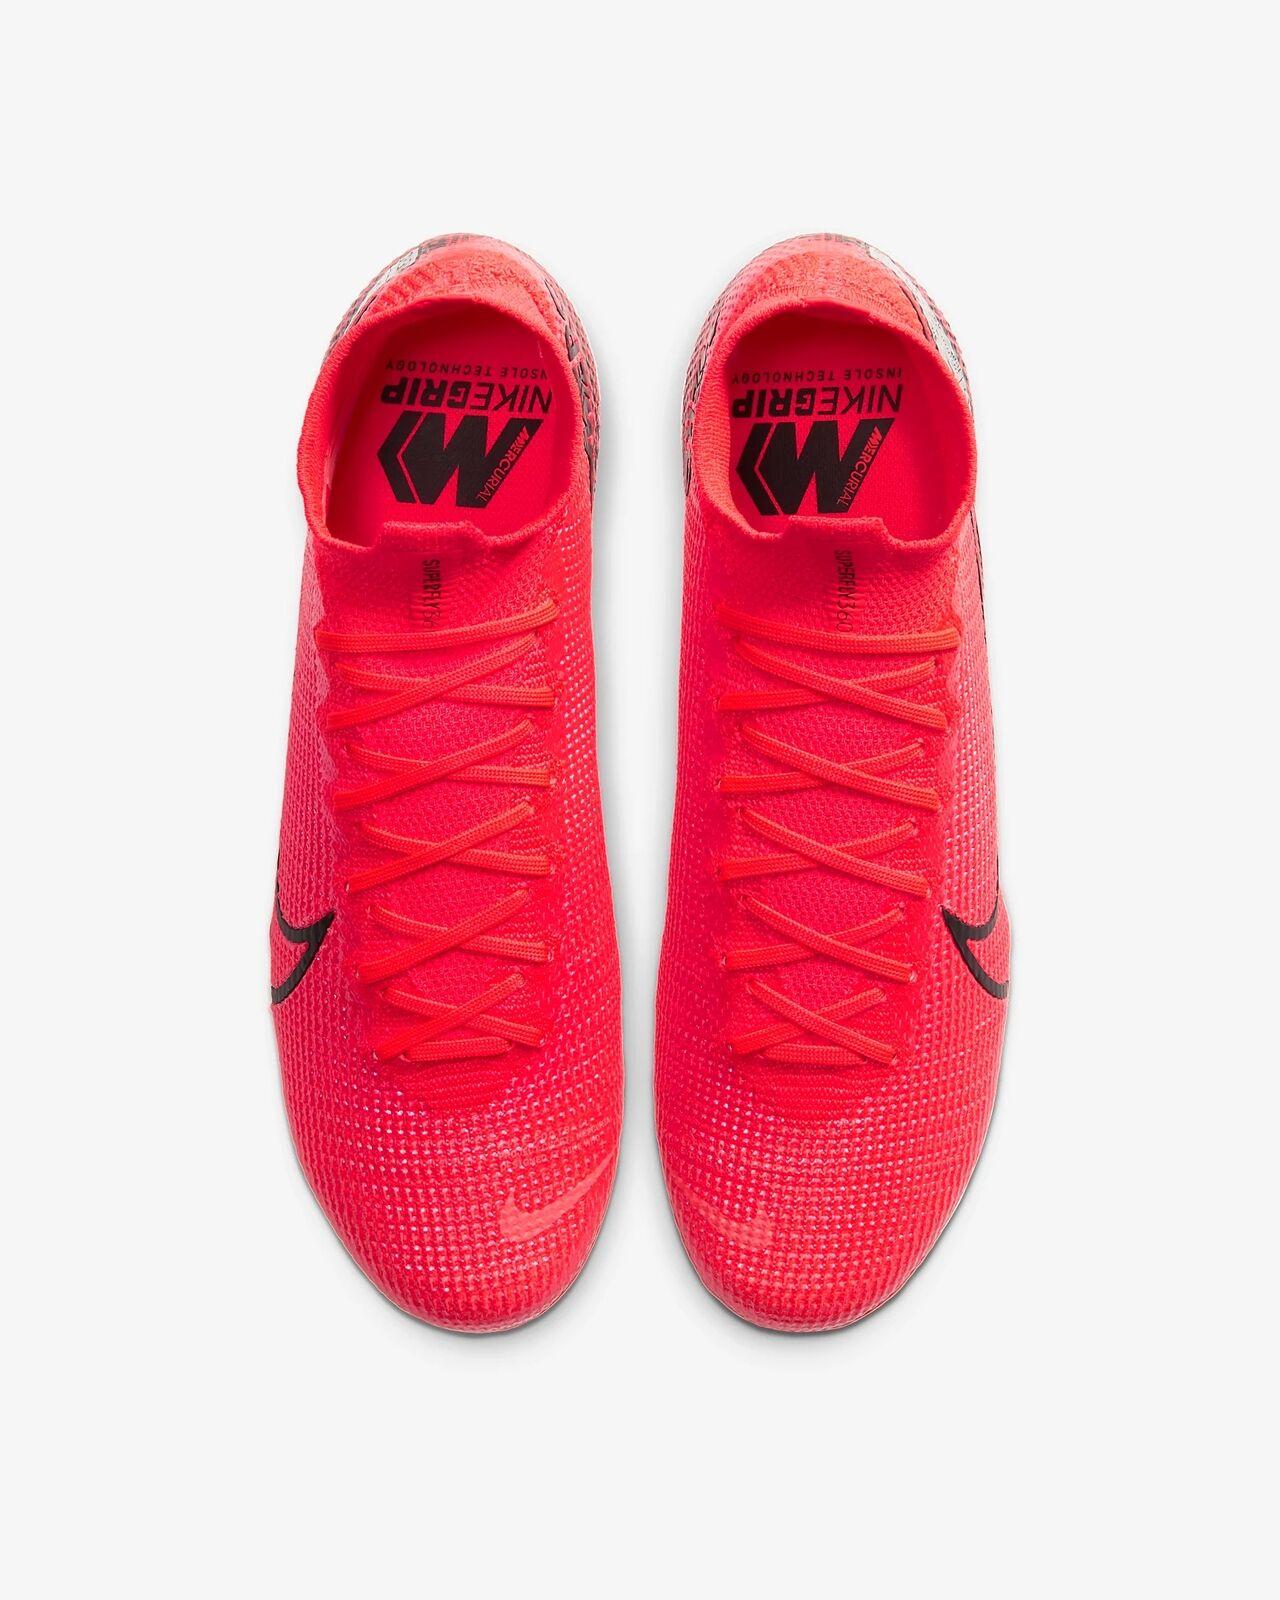 Zapatillas de Futbol para Hombre Nike Superfly 7 Elite SG-PRO rojo carmesi